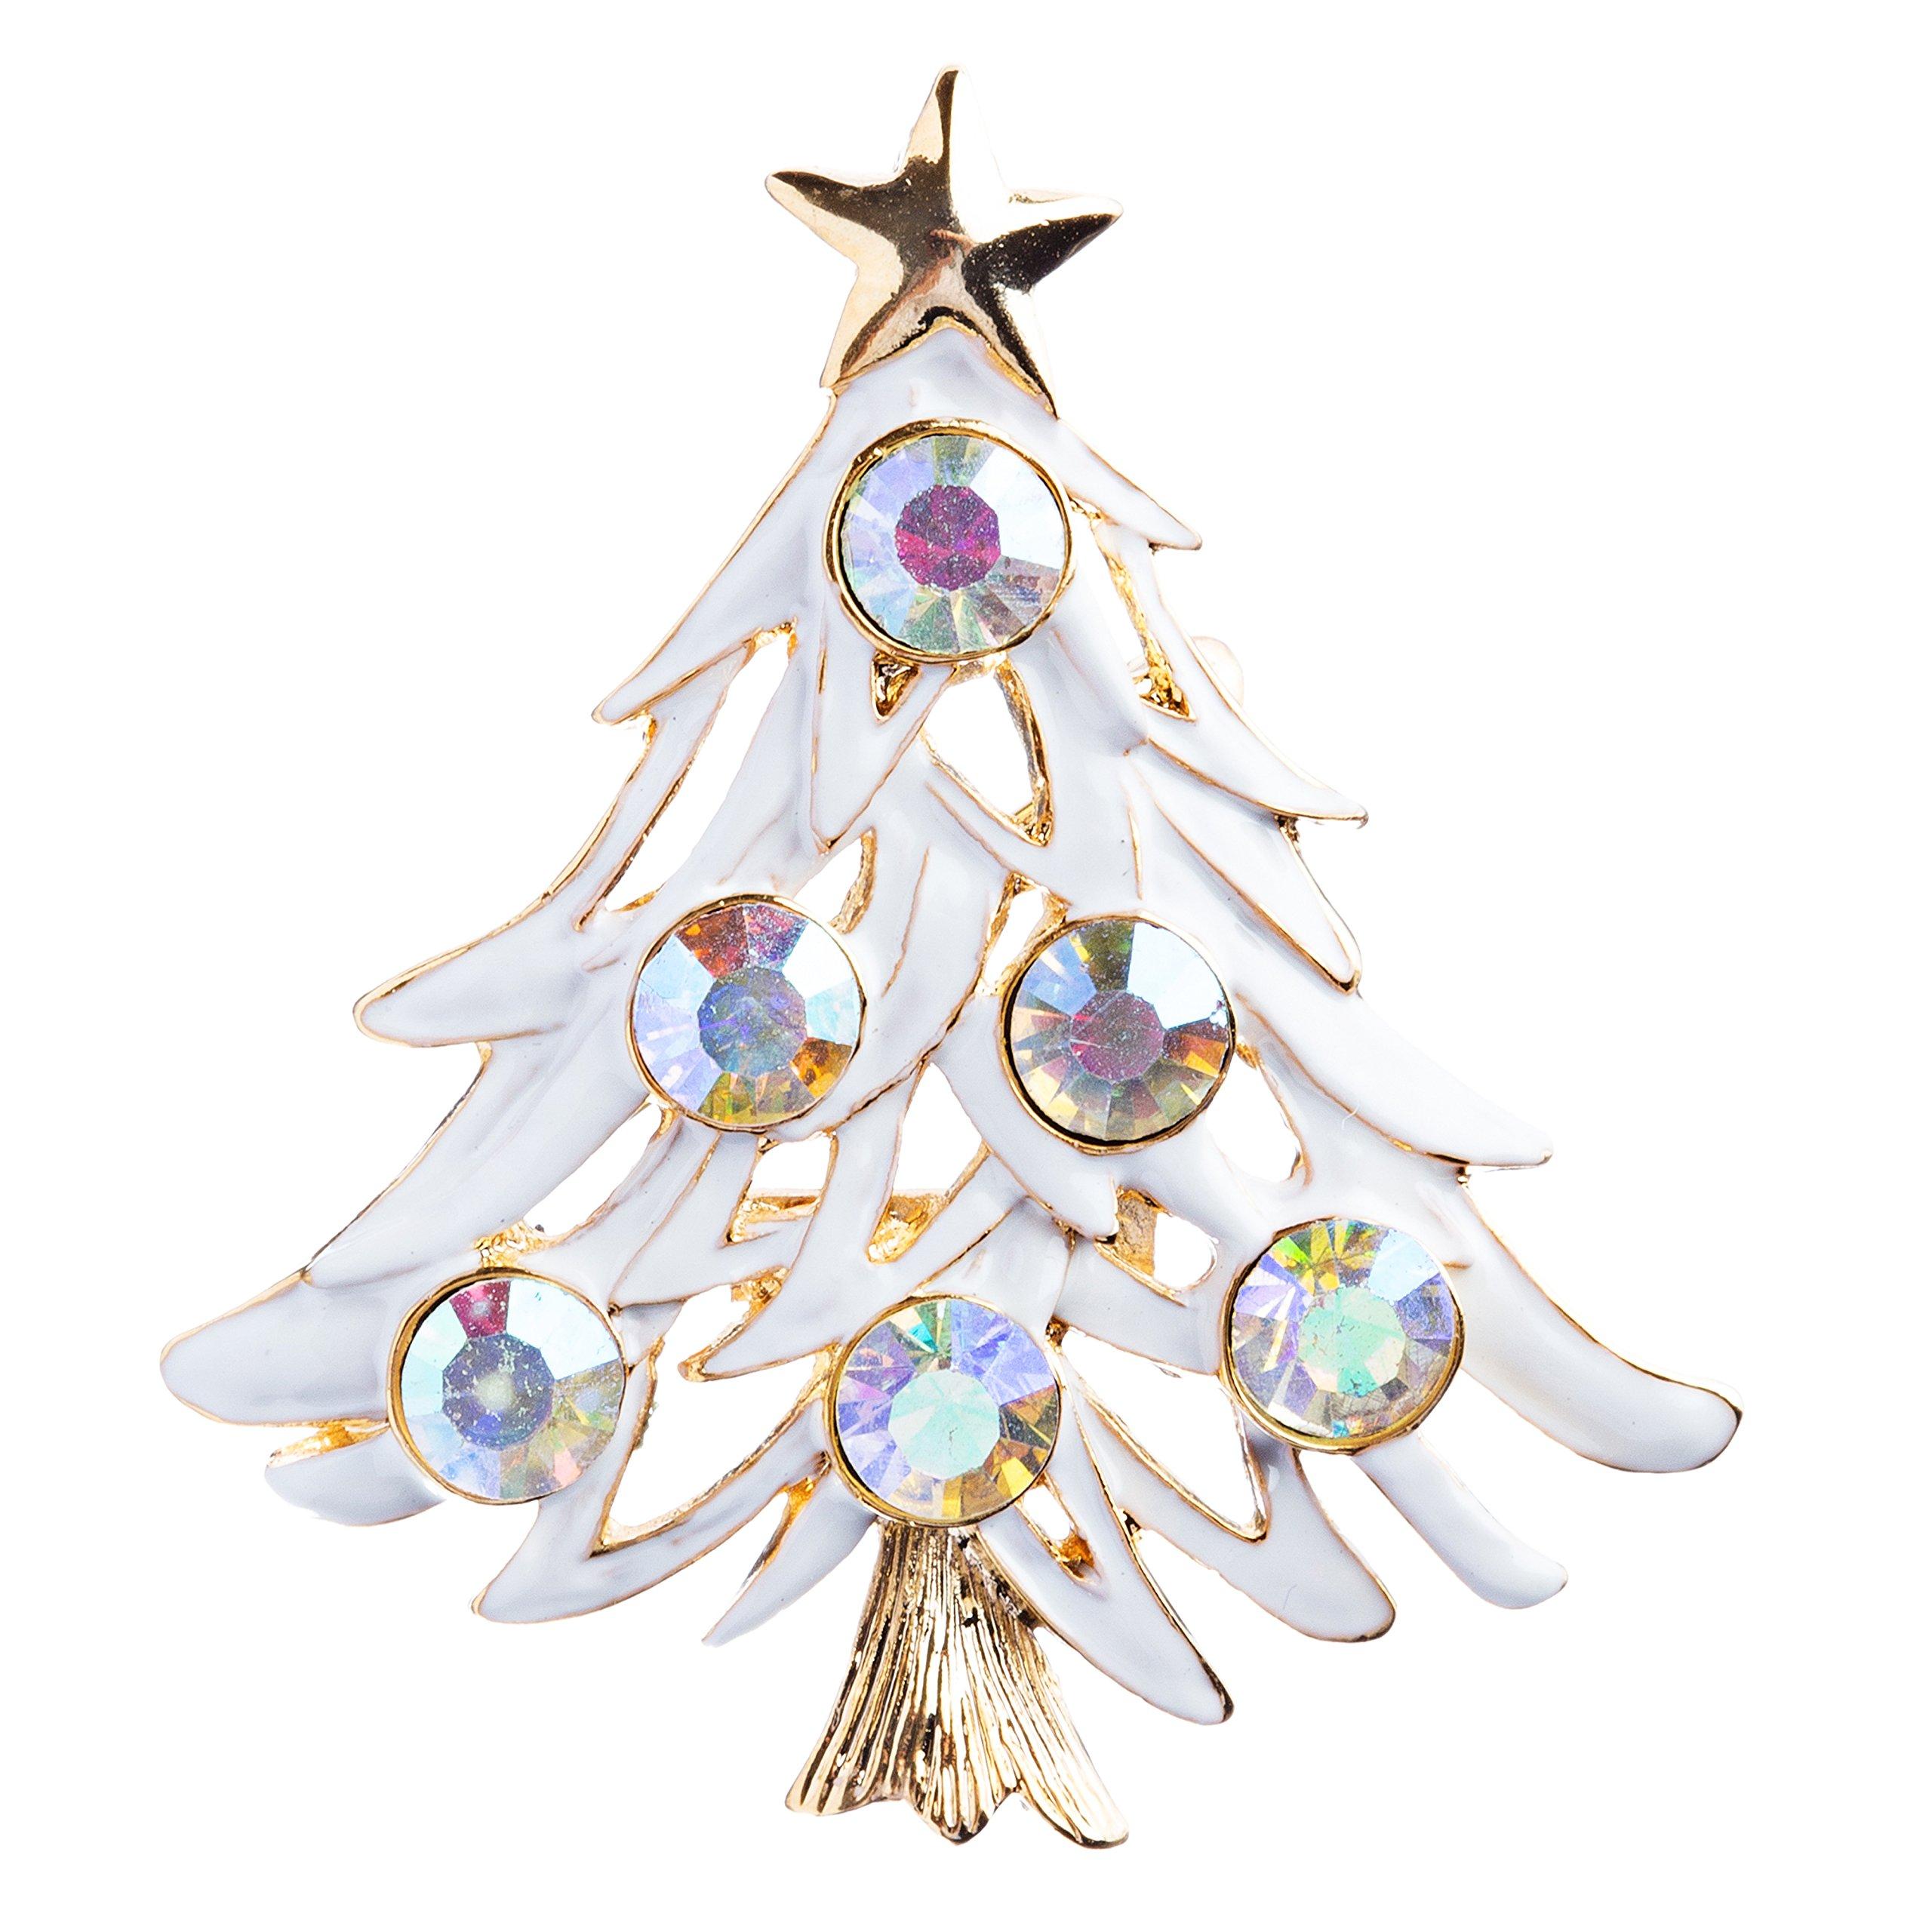 ACCESSORIESFOREVER Christmas Jewelry Crystal Rhinestone Elegant Colorful Tree Brooch Pin BH87 Multi